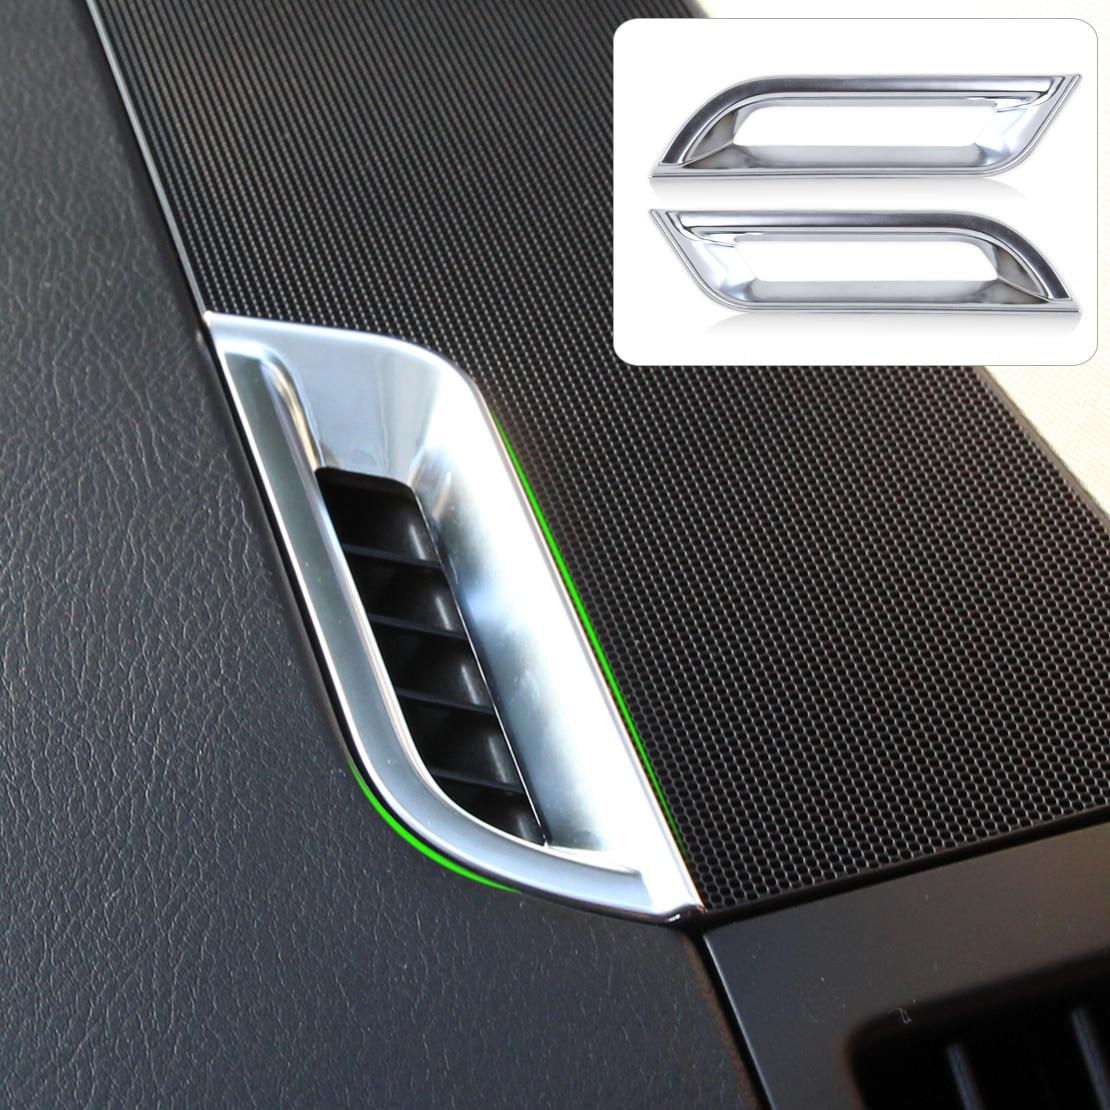 dwcx car styling 2pcs chrome dashboard ac air vent trim cover for land rover freelander 2 lr2. Black Bedroom Furniture Sets. Home Design Ideas